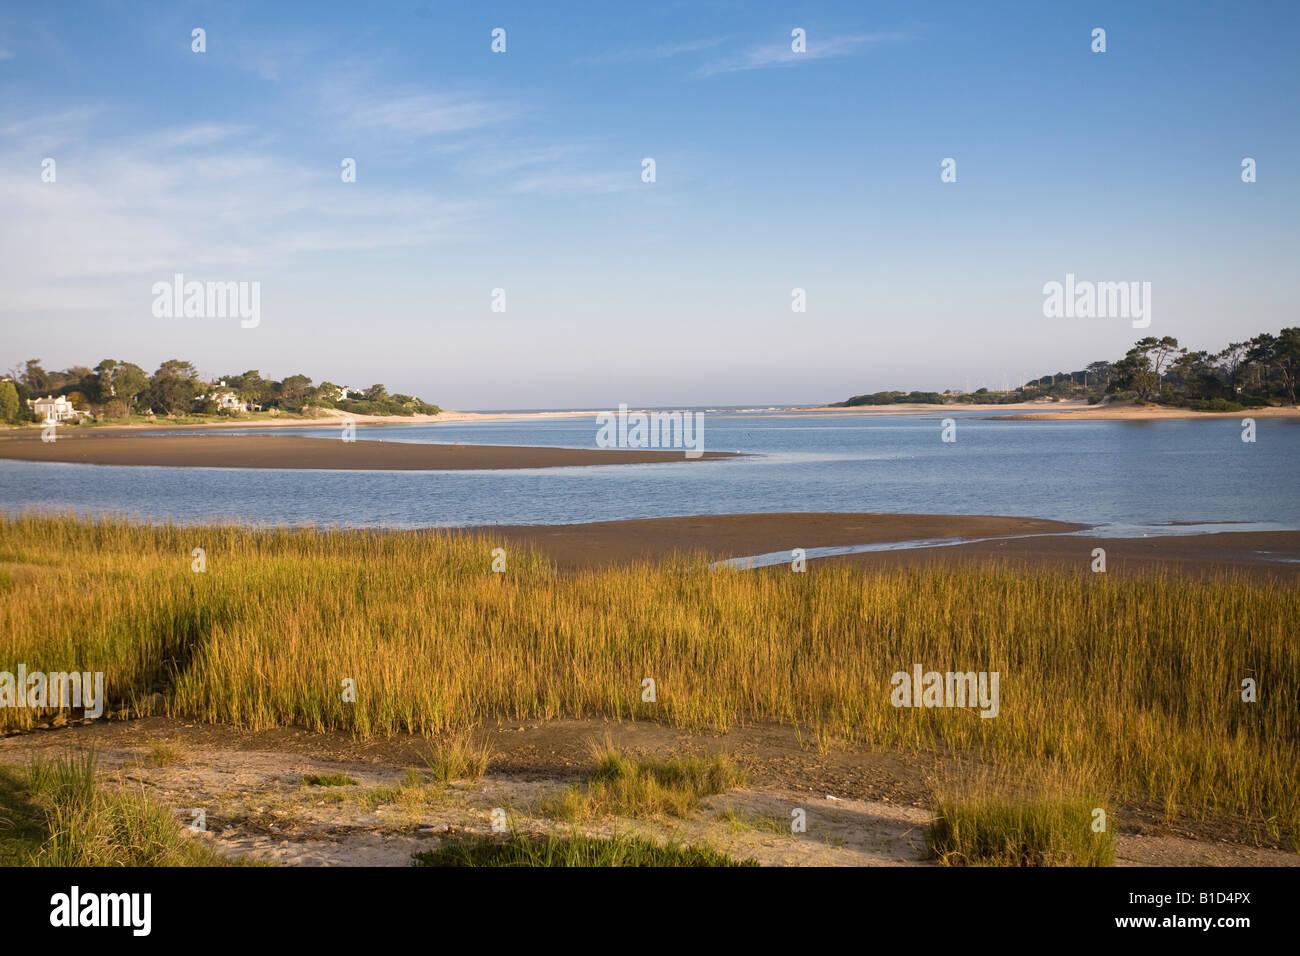 La Barra de Maldonado Punta del Este Uruguay - Stock Image